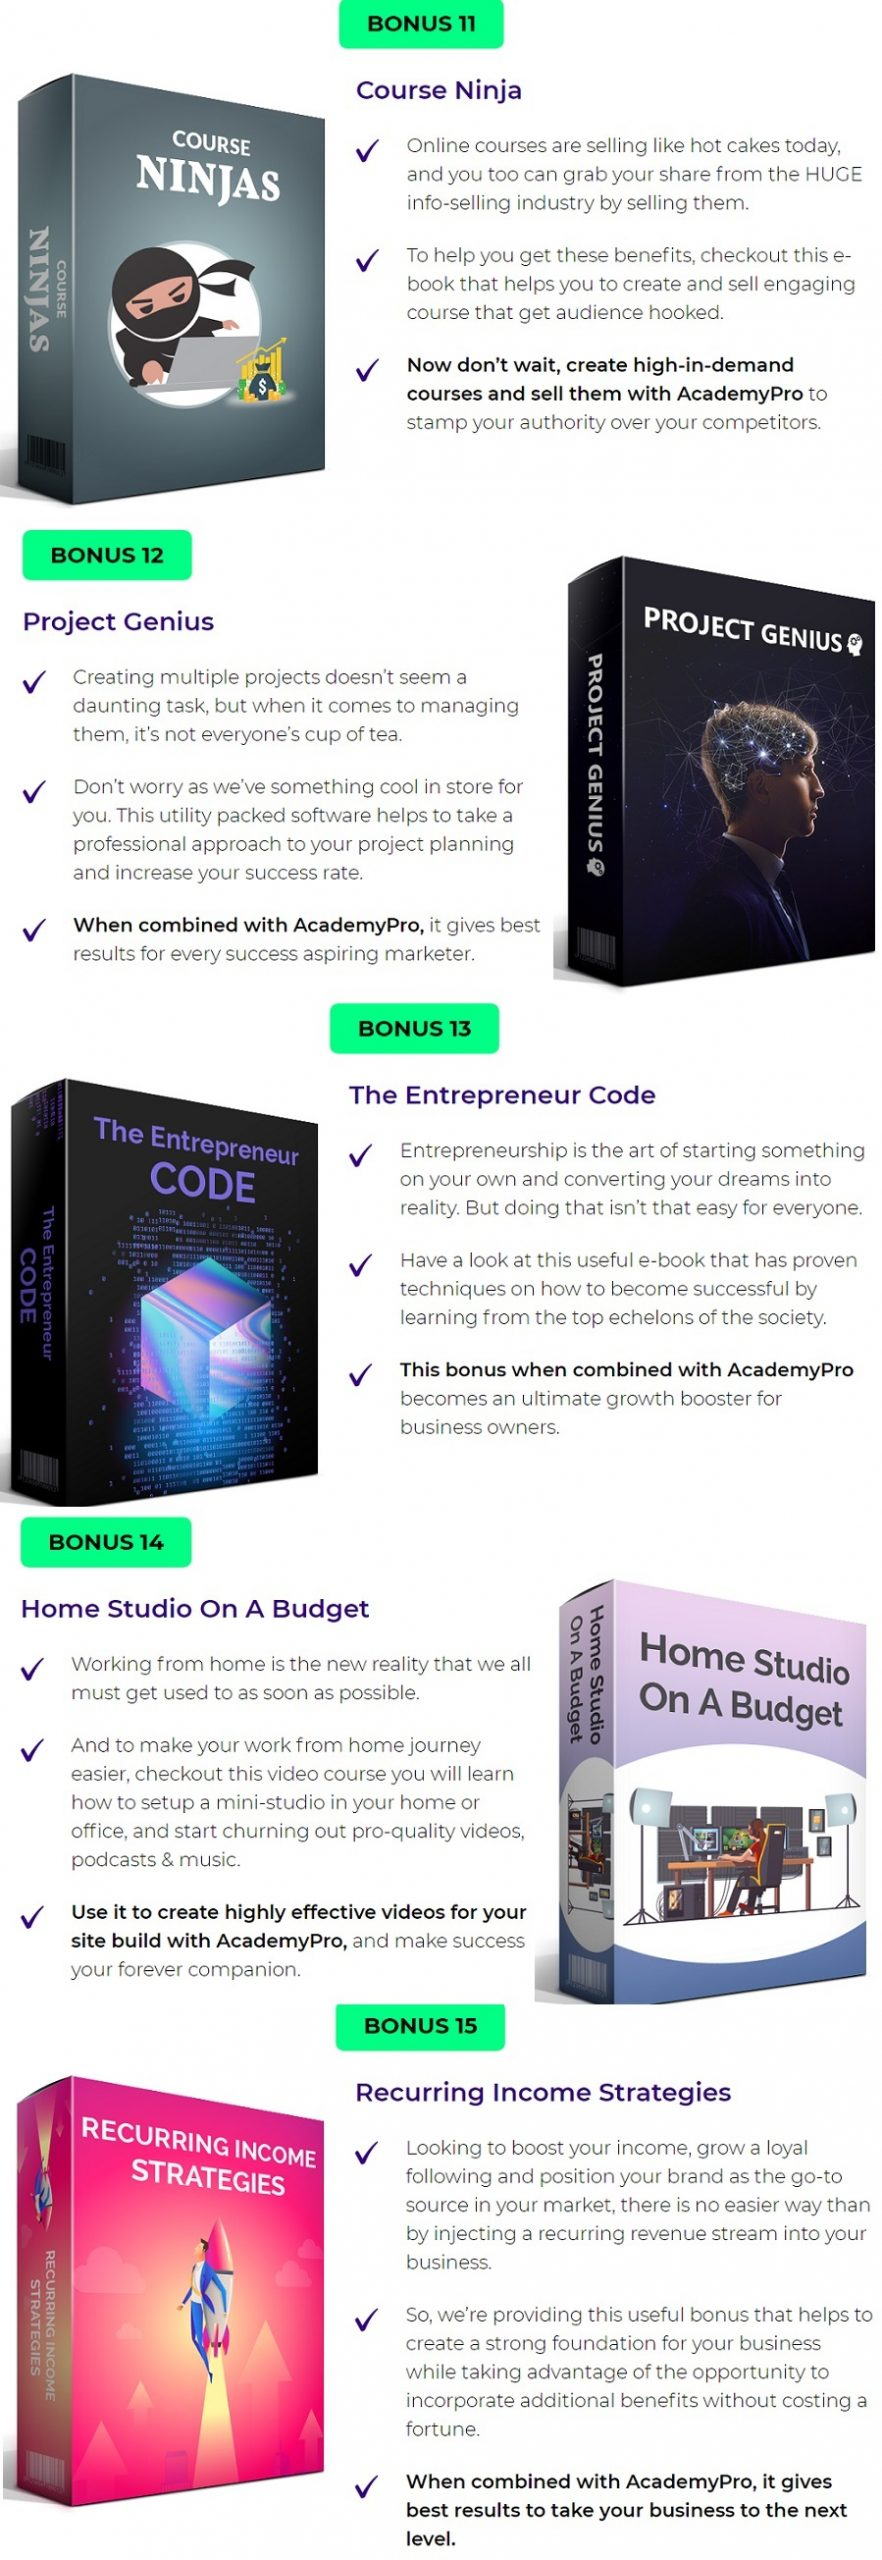 Academypro bonus discount